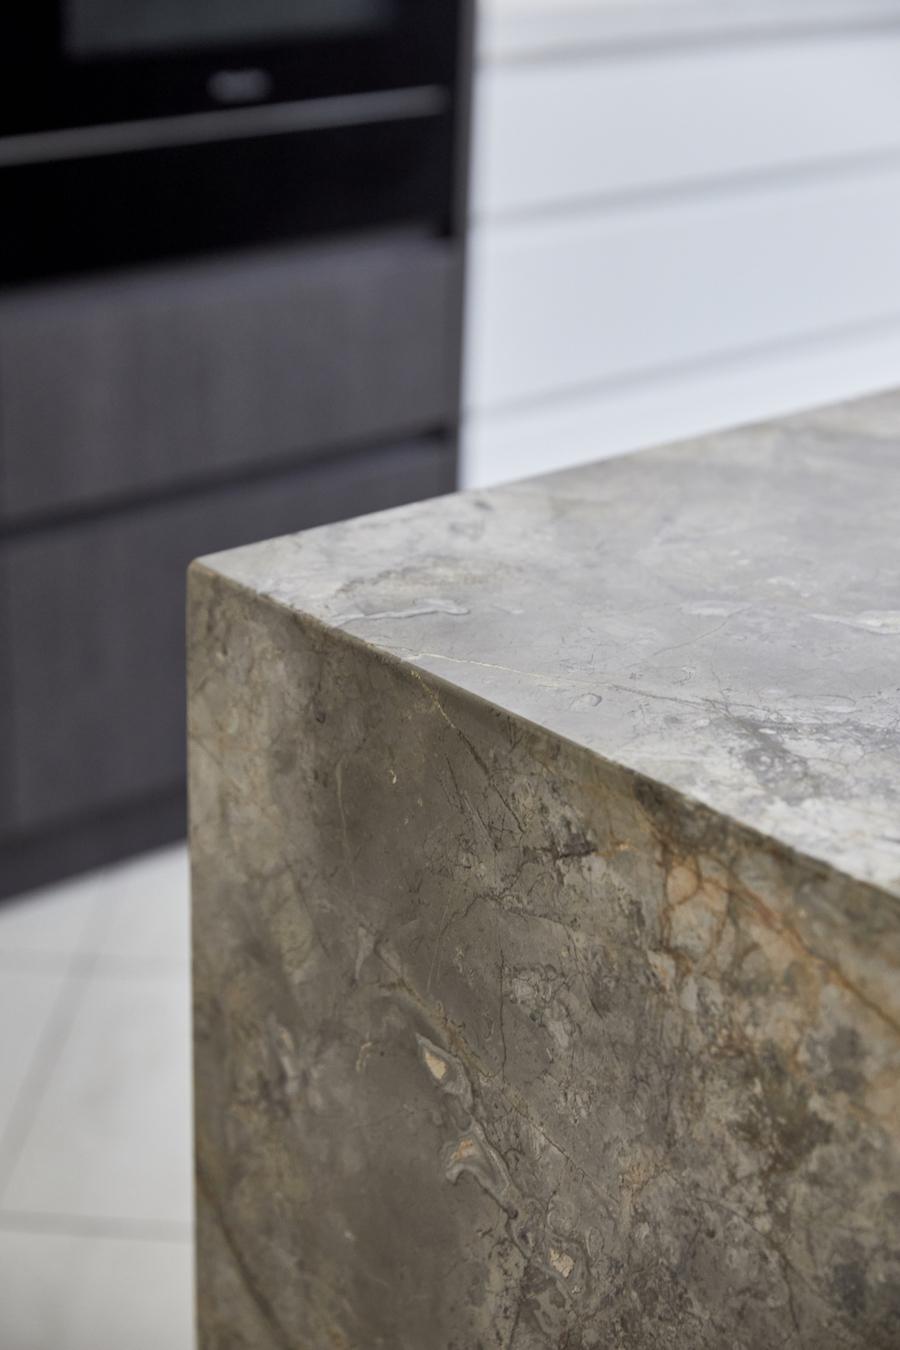 https://www.stone-tech.com.au/wp-content/uploads/Stone-Tech-Dural_-124.jpg